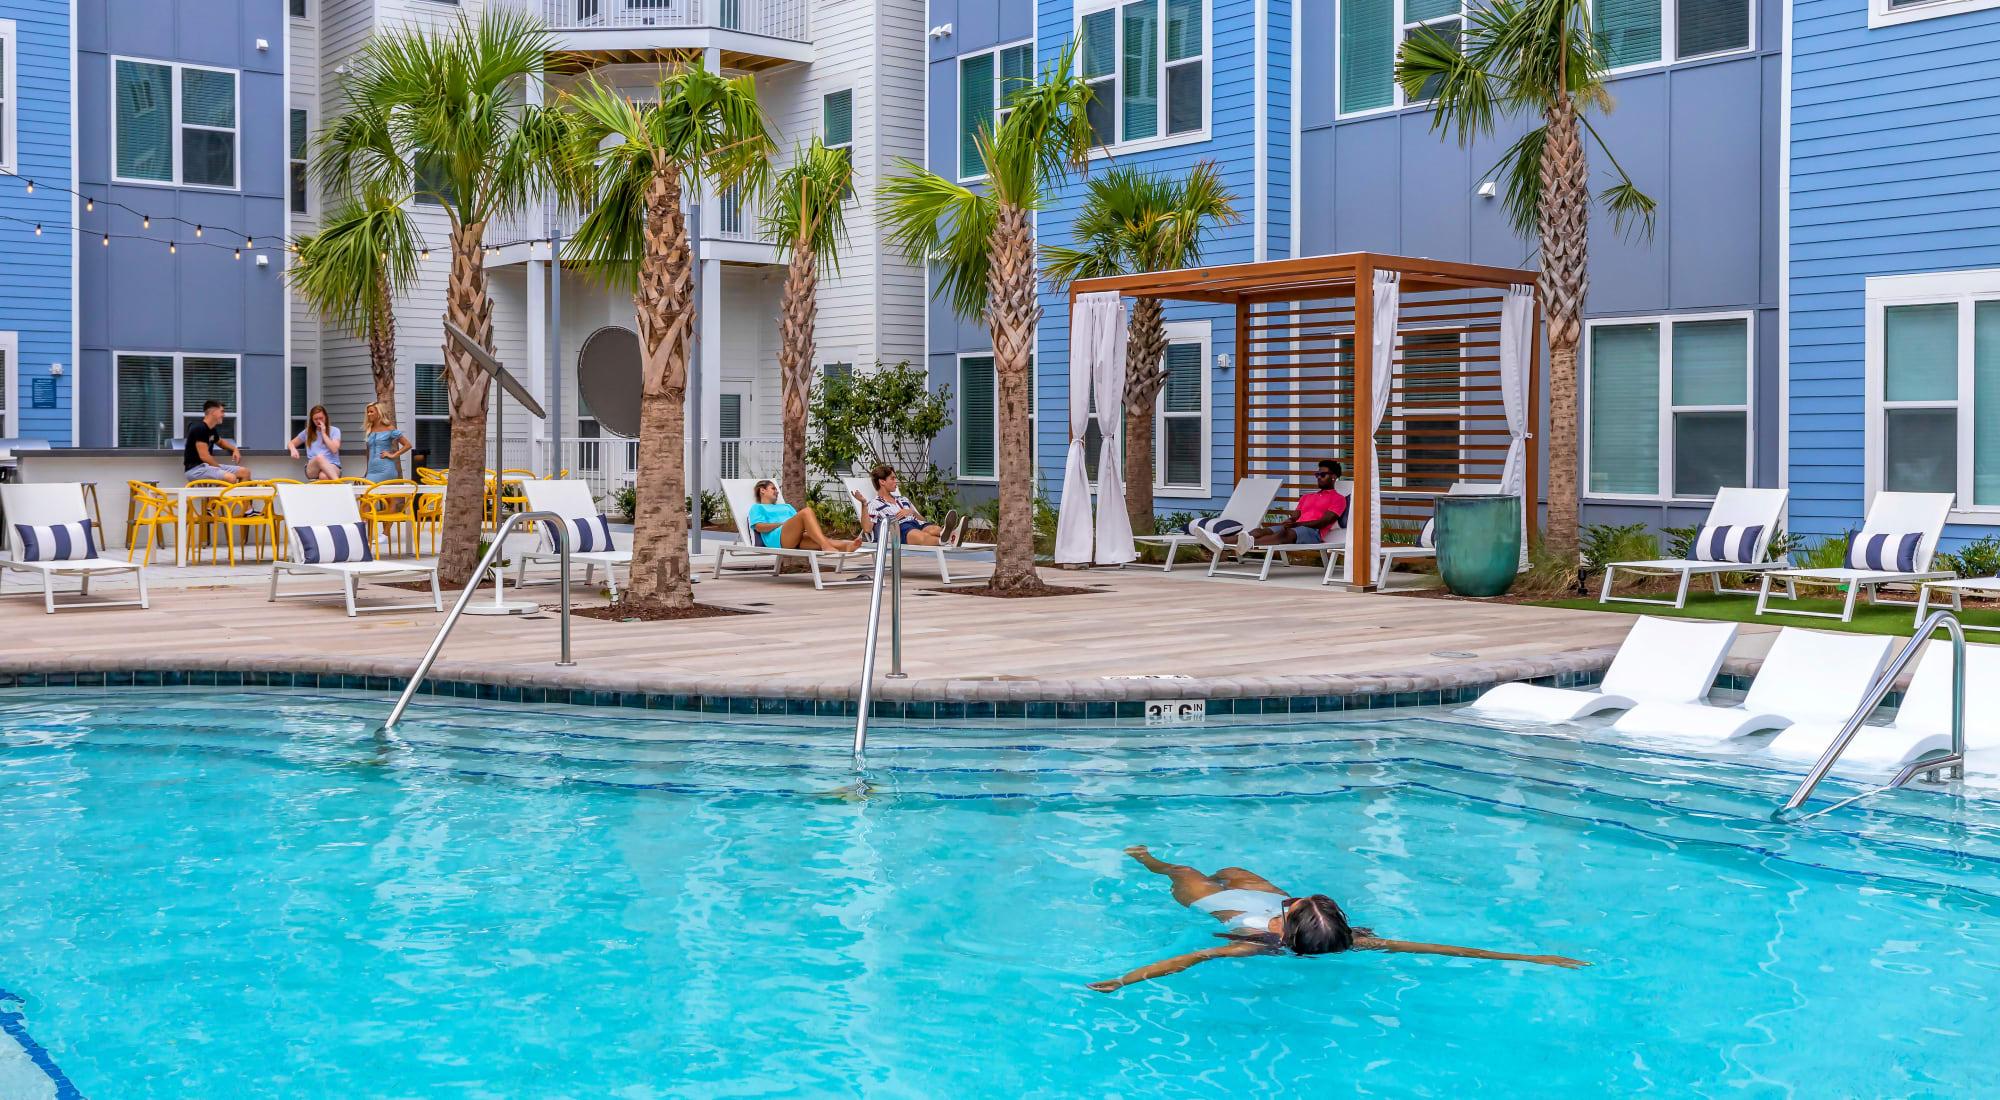 Apartments at UNCOMMON Wilmington in Wilmington, North Carolina